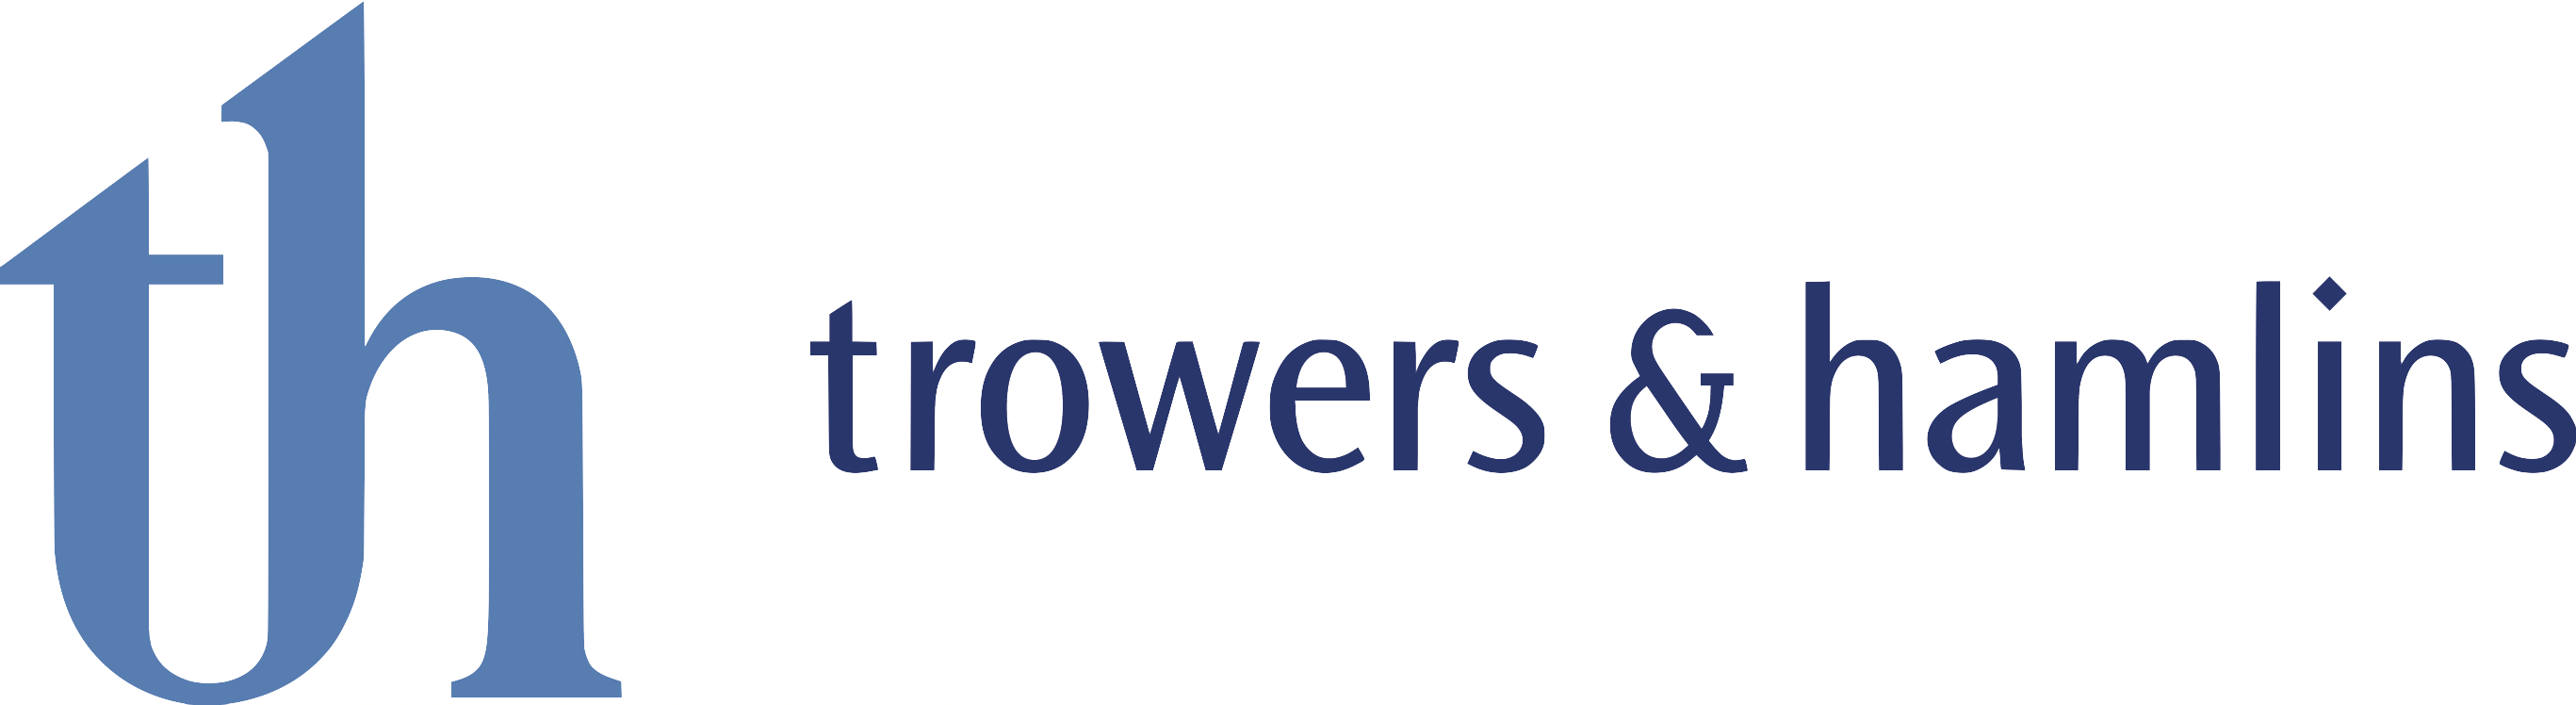 trowers-hamlins-logo